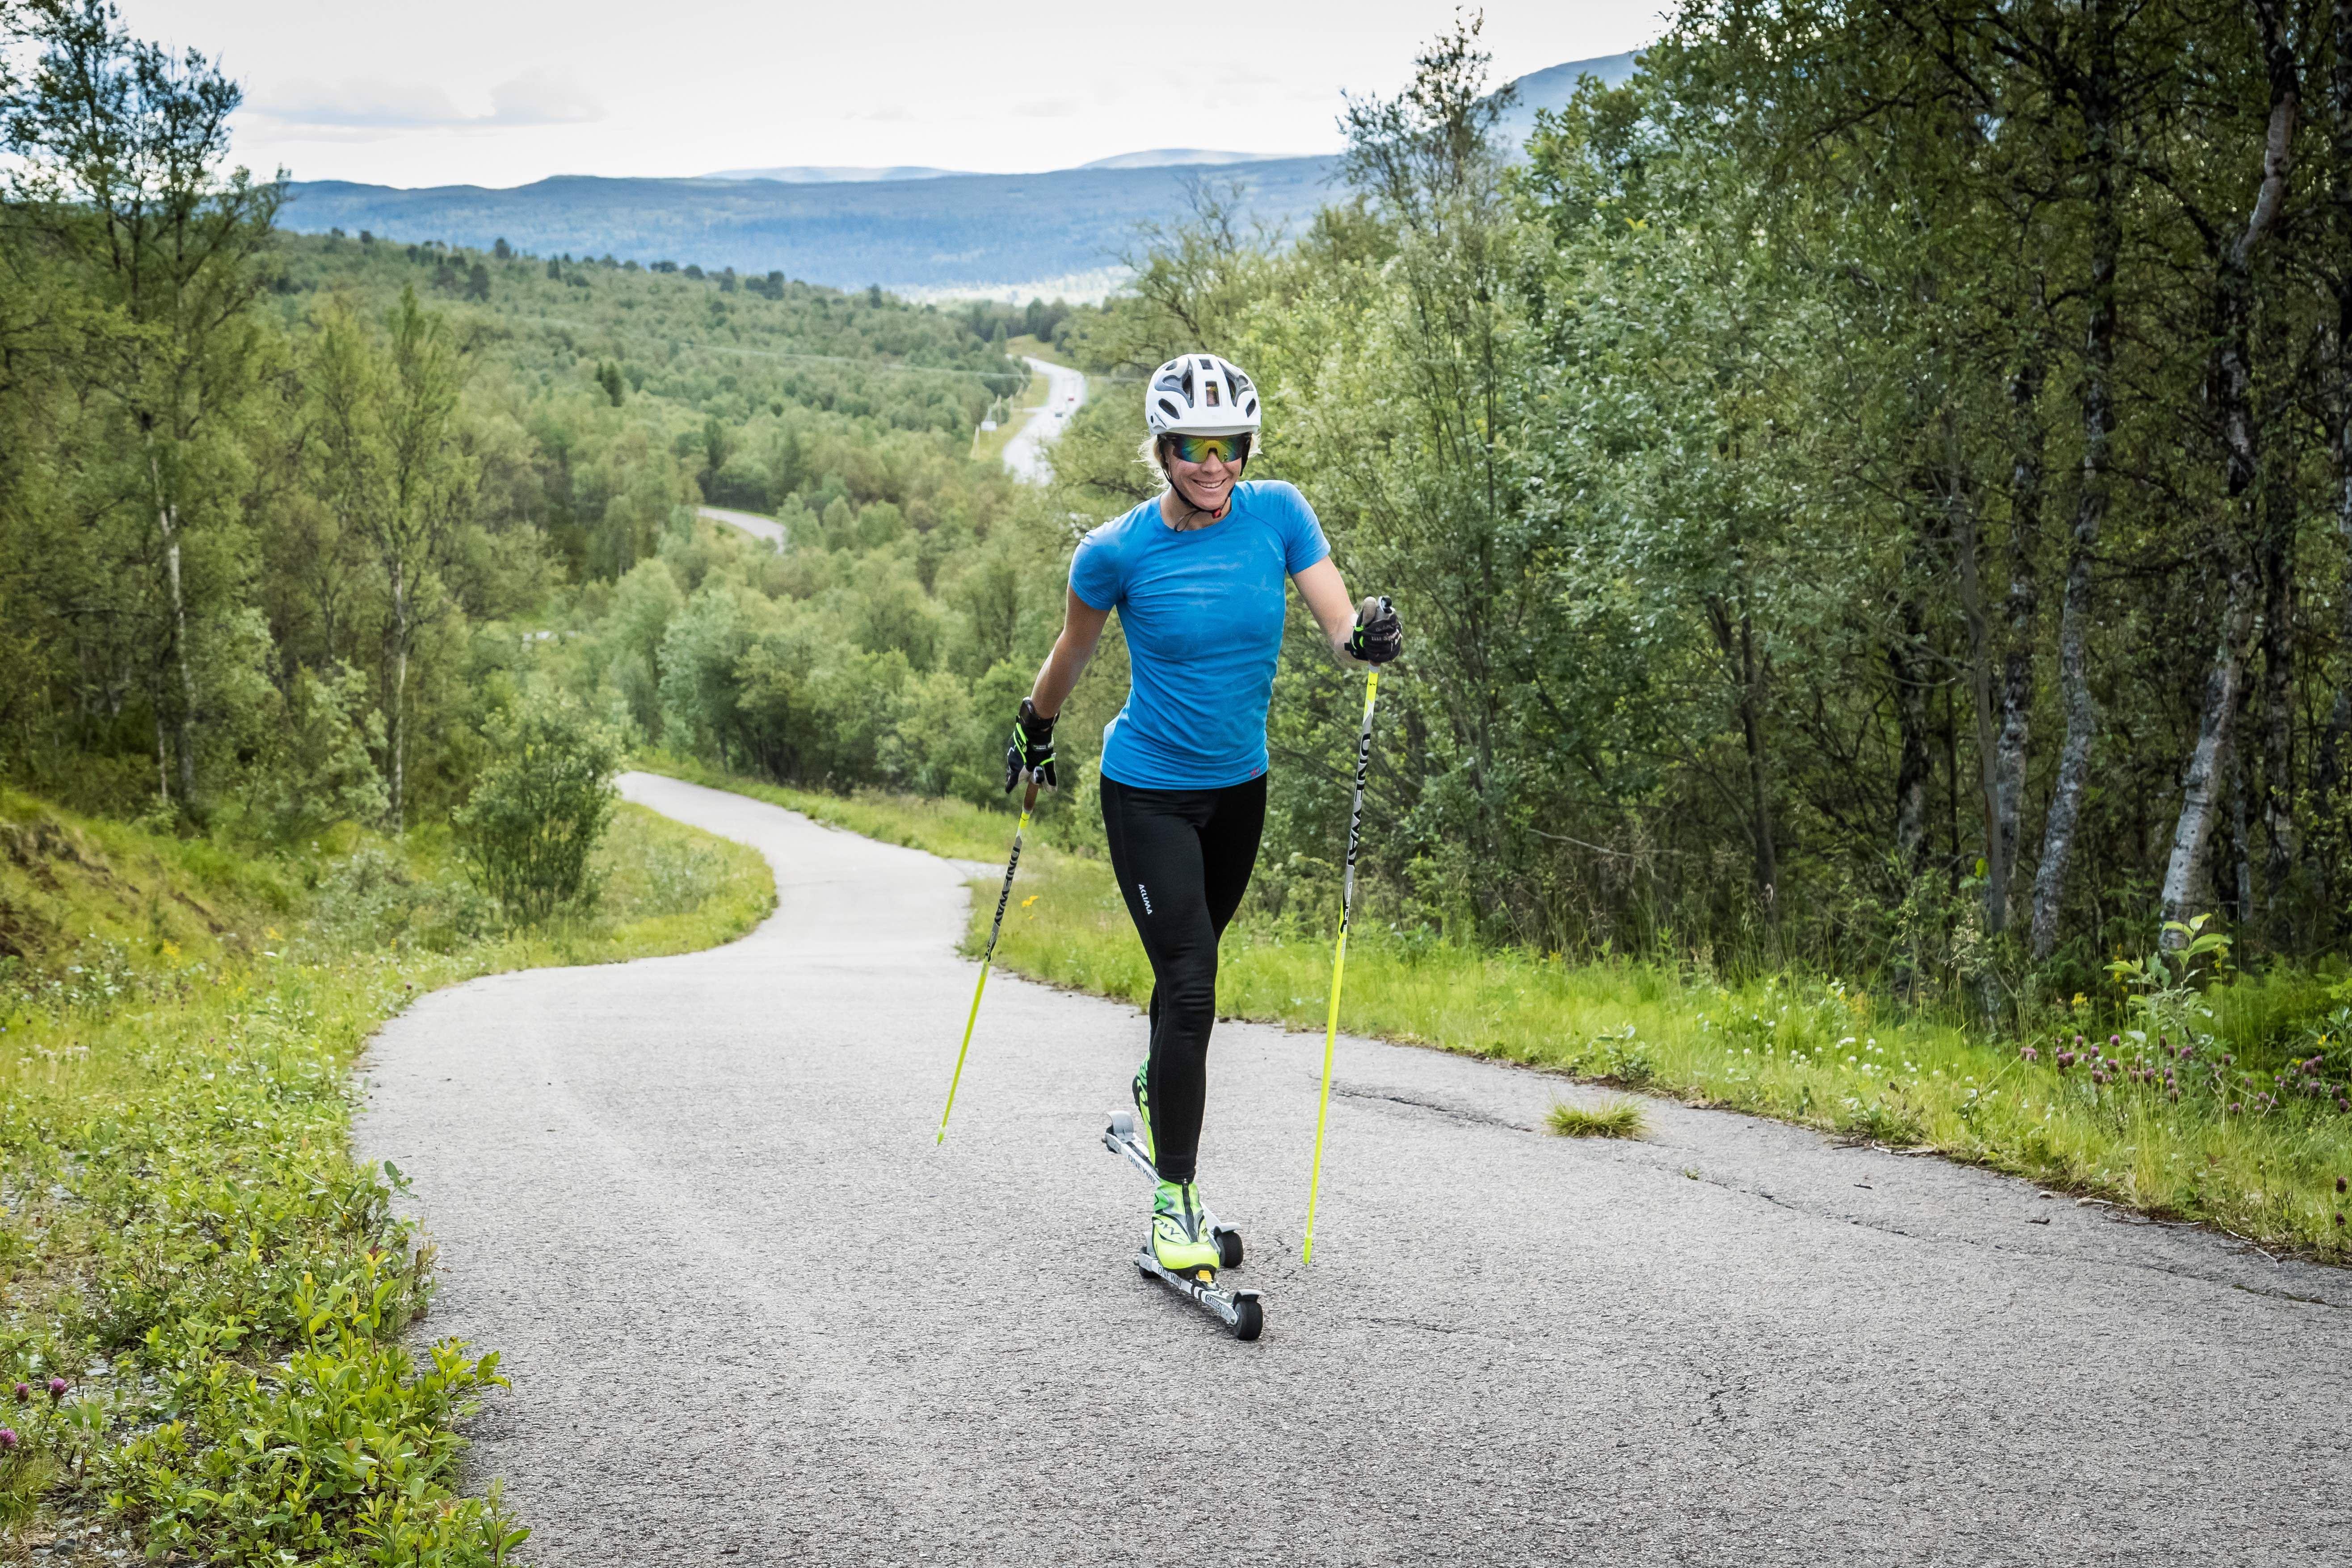 Mikaelas Skidskola - Personlig Träning Online